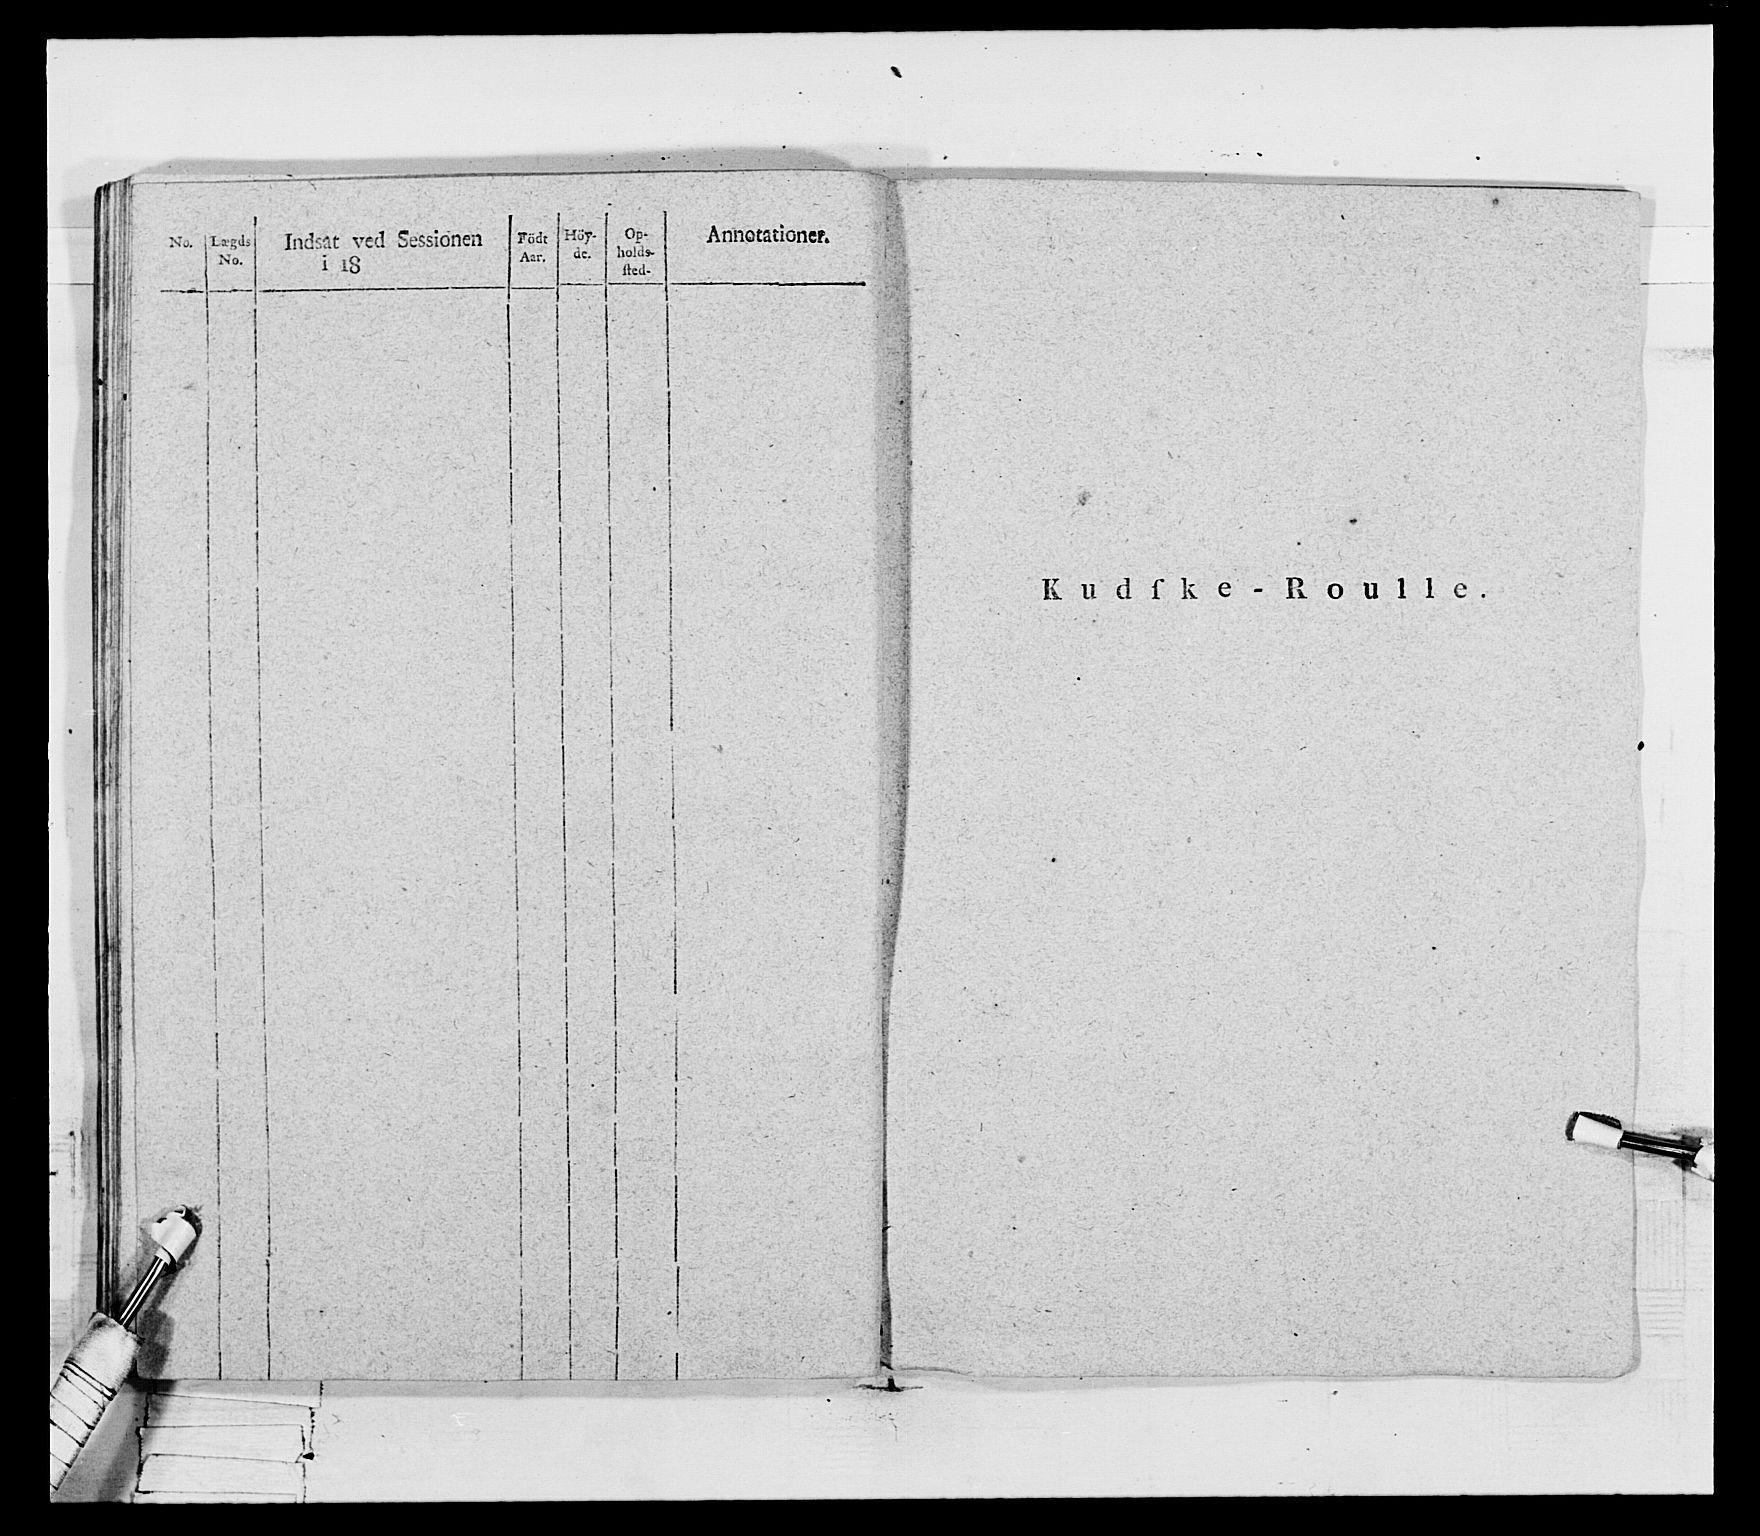 RA, Generalitets- og kommissariatskollegiet, Det kongelige norske kommissariatskollegium, E/Eh/L0069: Opplandske gevorbne infanteriregiment, 1810-1818, s. 150